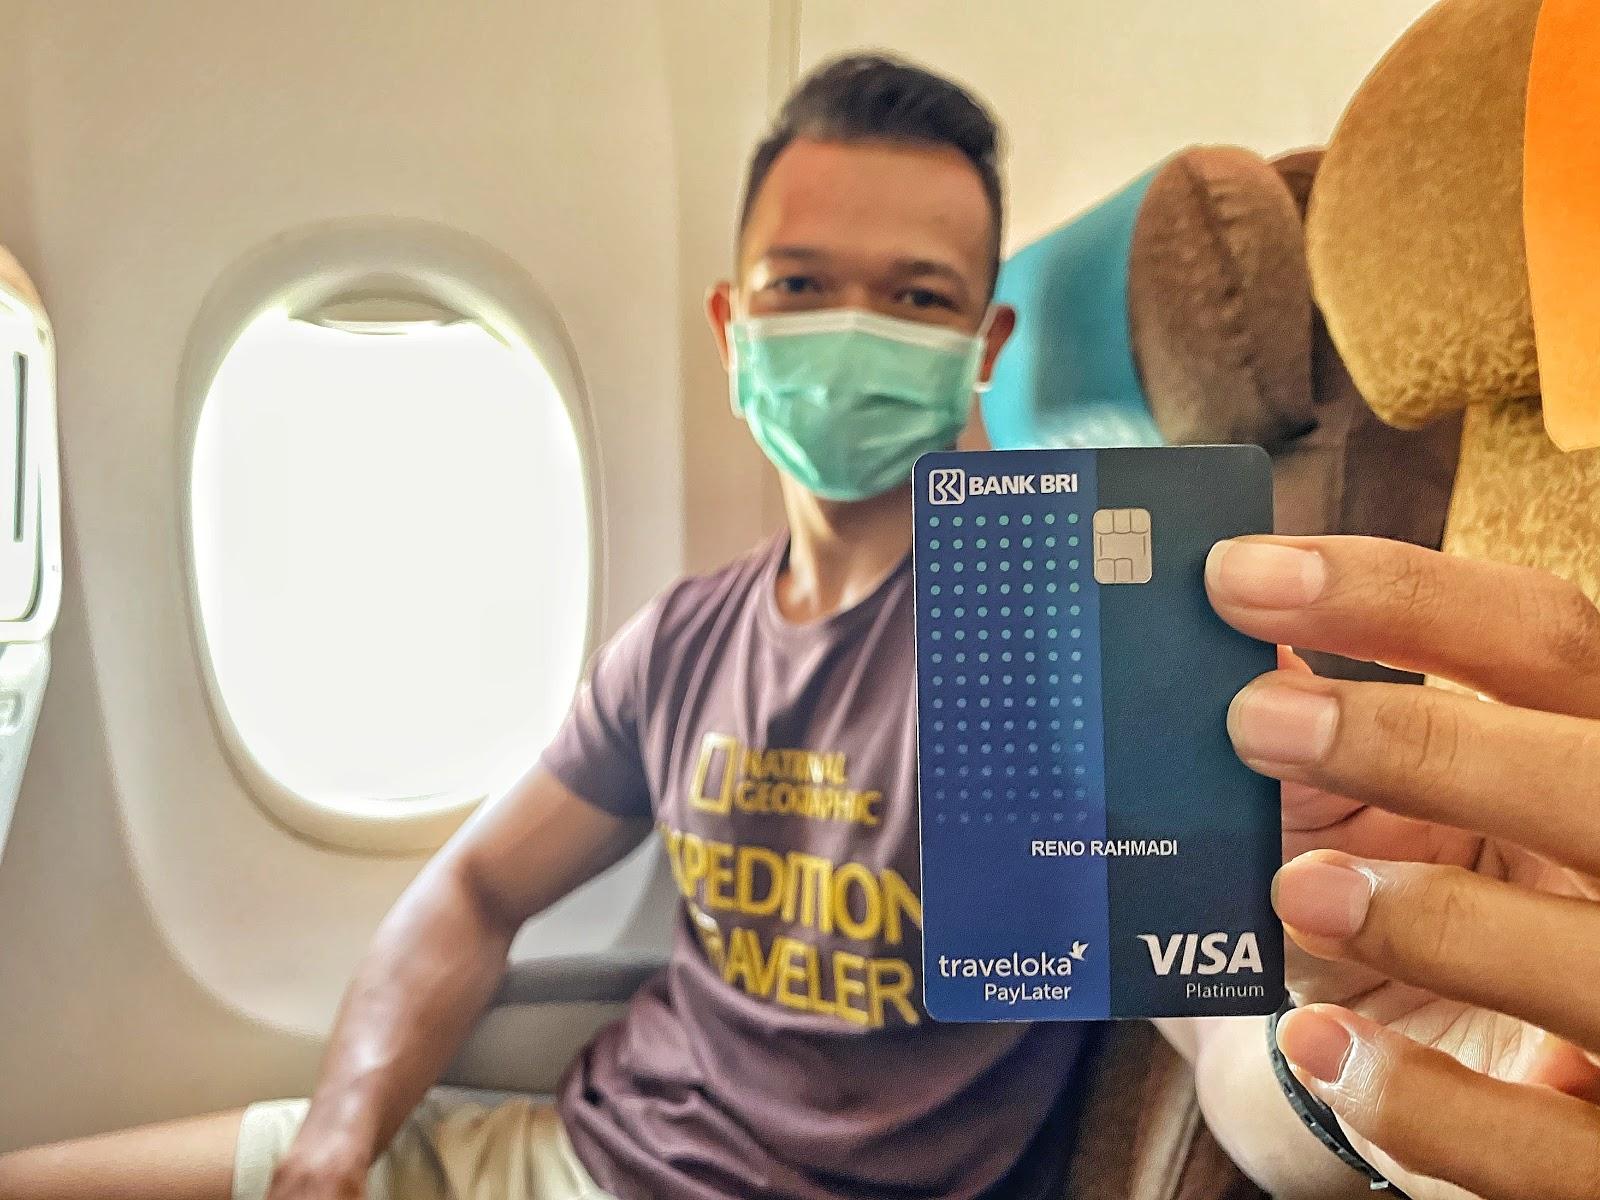 Thẻ tín dụng PayLater của Traveloka. Ảnh: Traveler Jakarta.